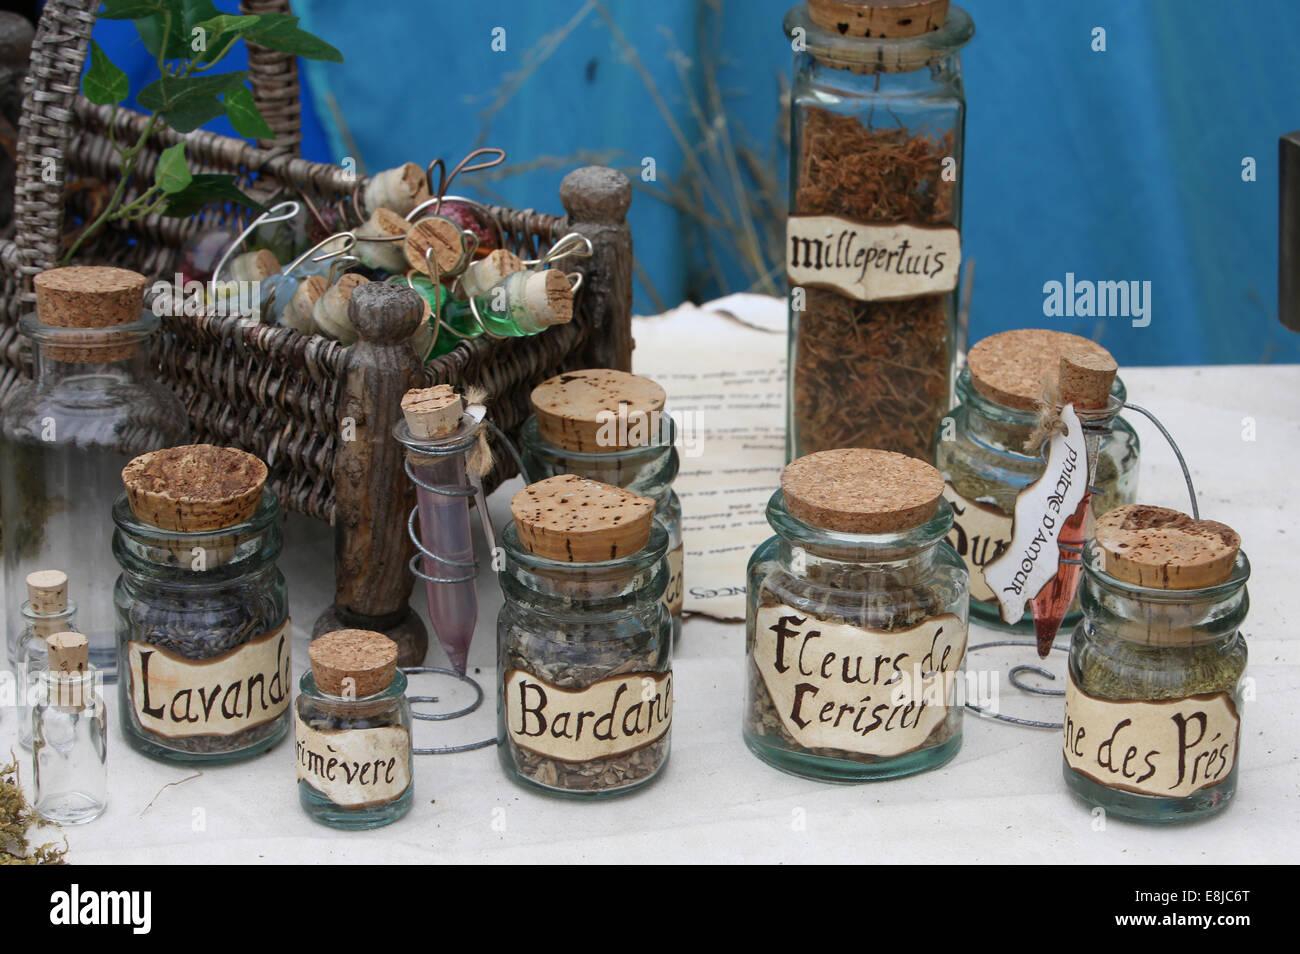 Handel mit Kräutern. Herbalist Produktion. Stockbild